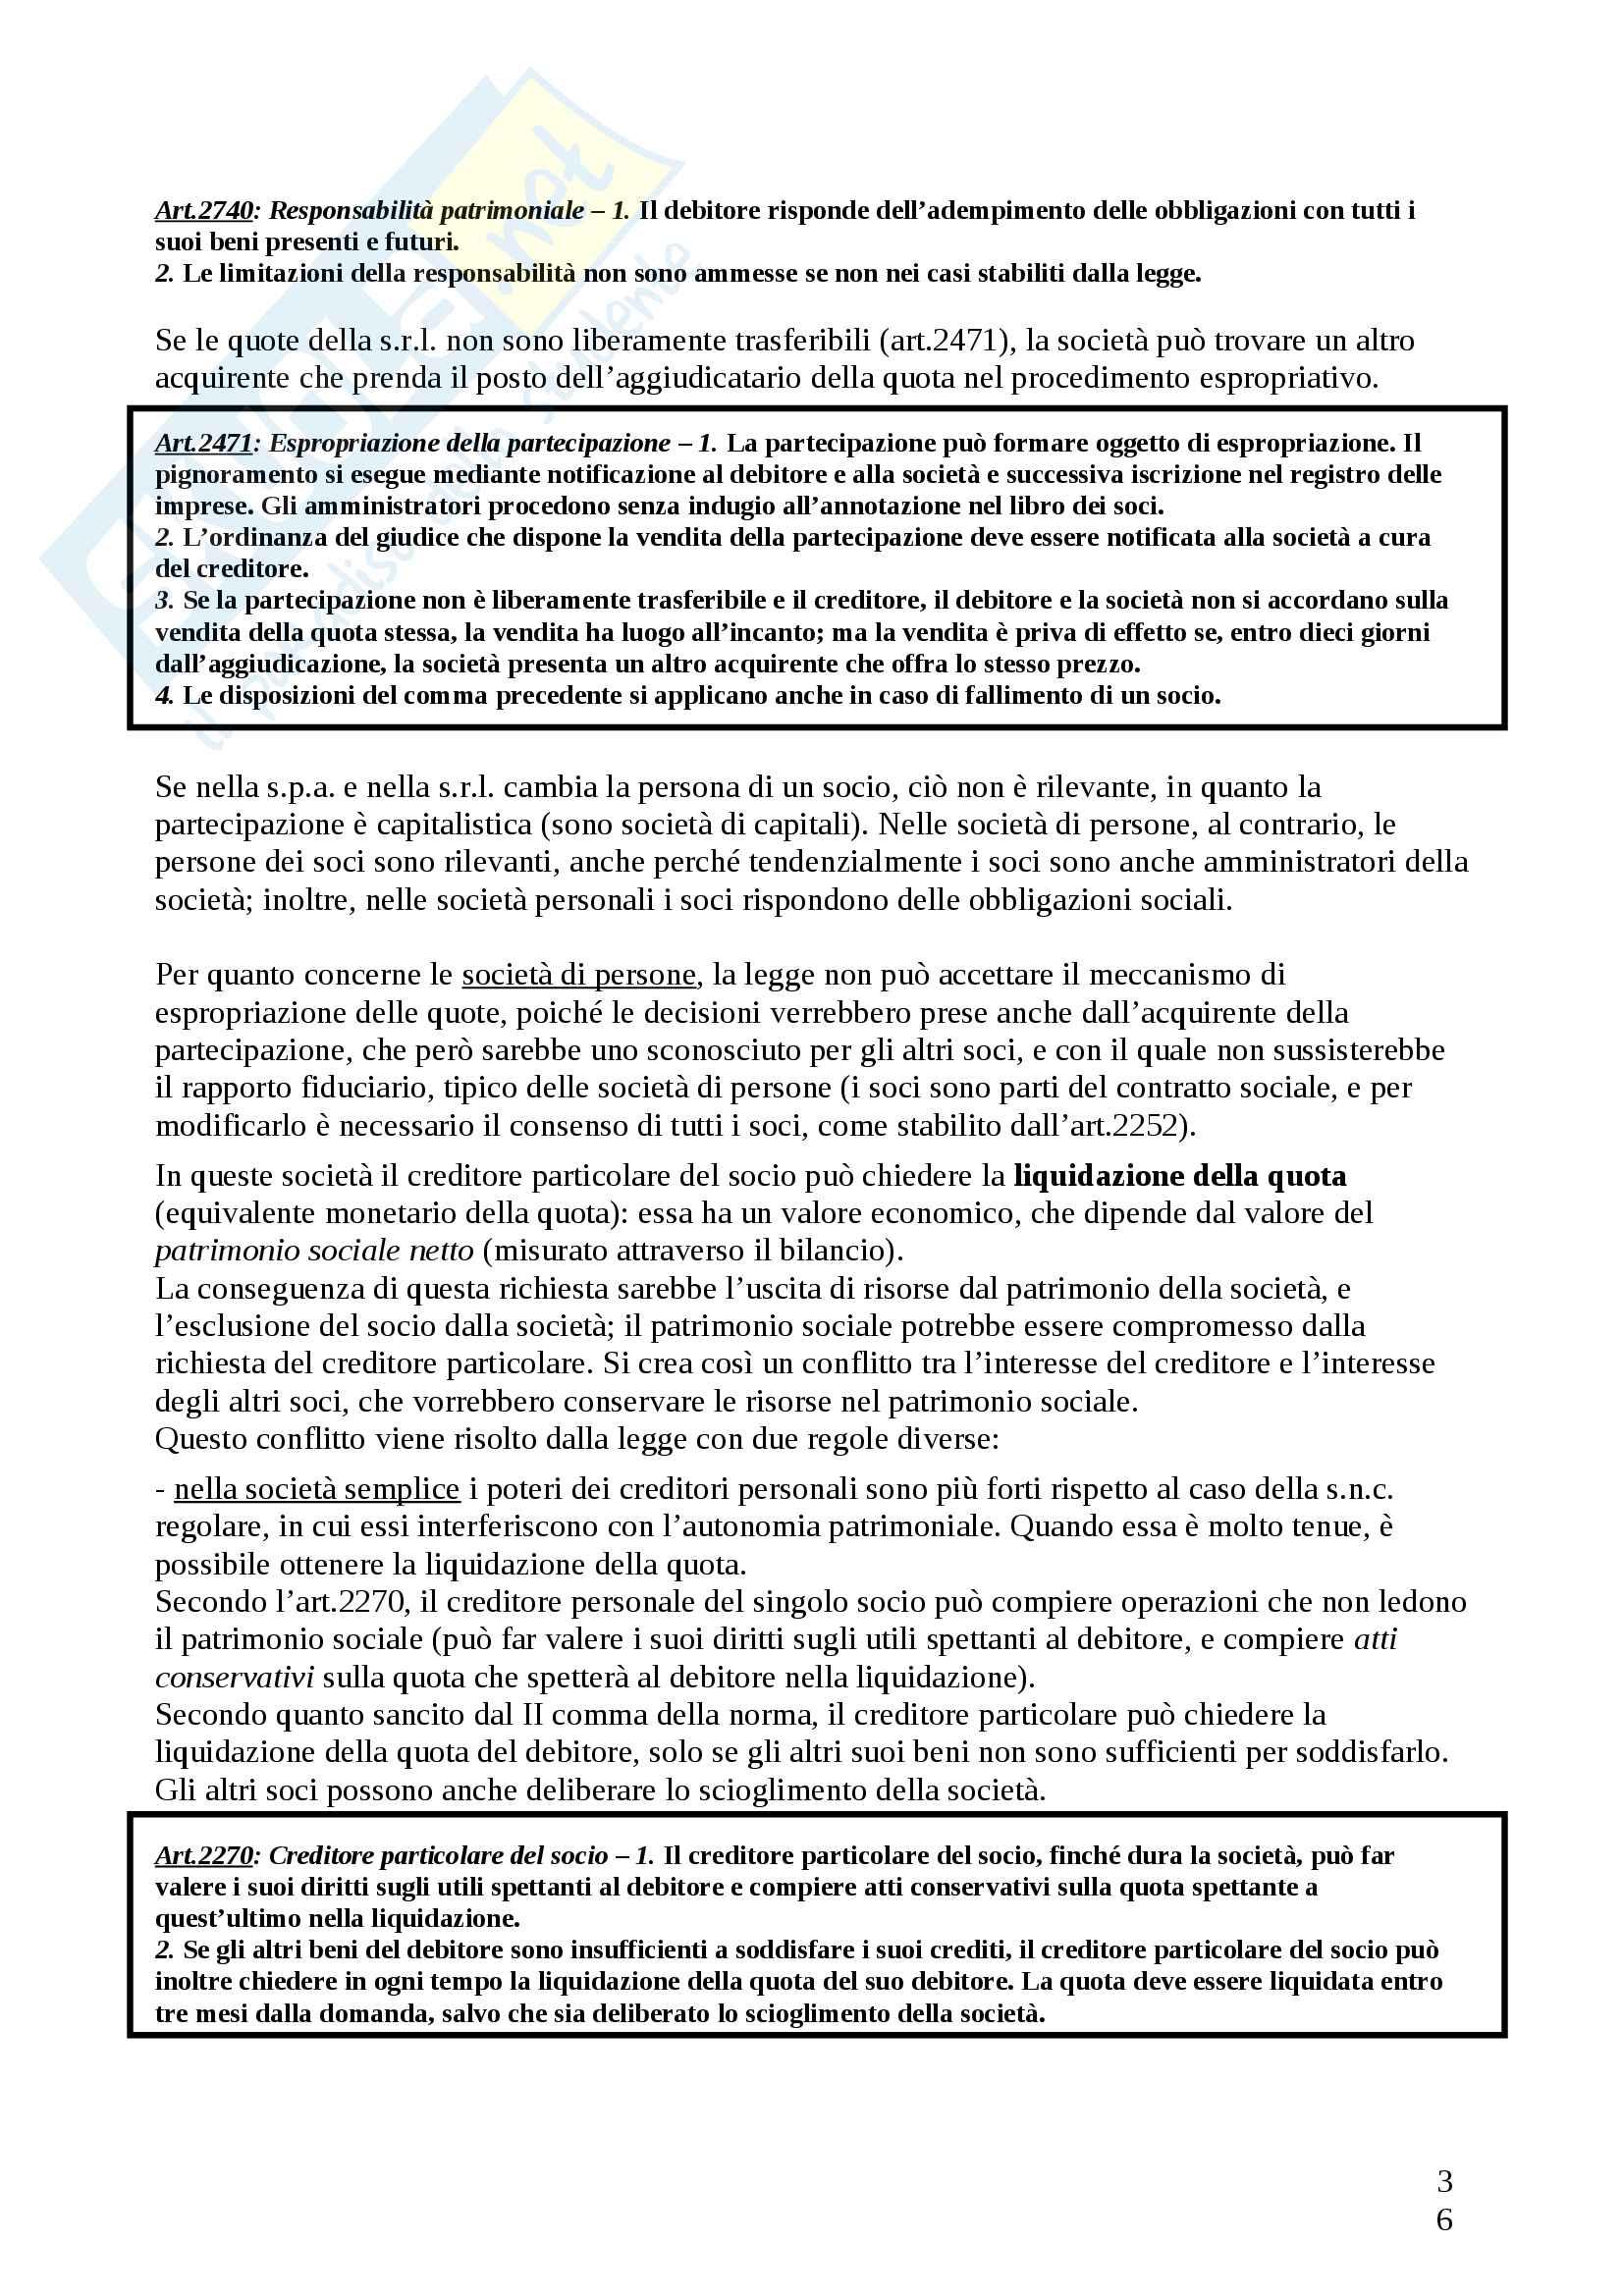 Riassunto esame diritto commerciale, Docente Santoni, Libro Manuale diritto commerciale, Campobasso Pag. 36